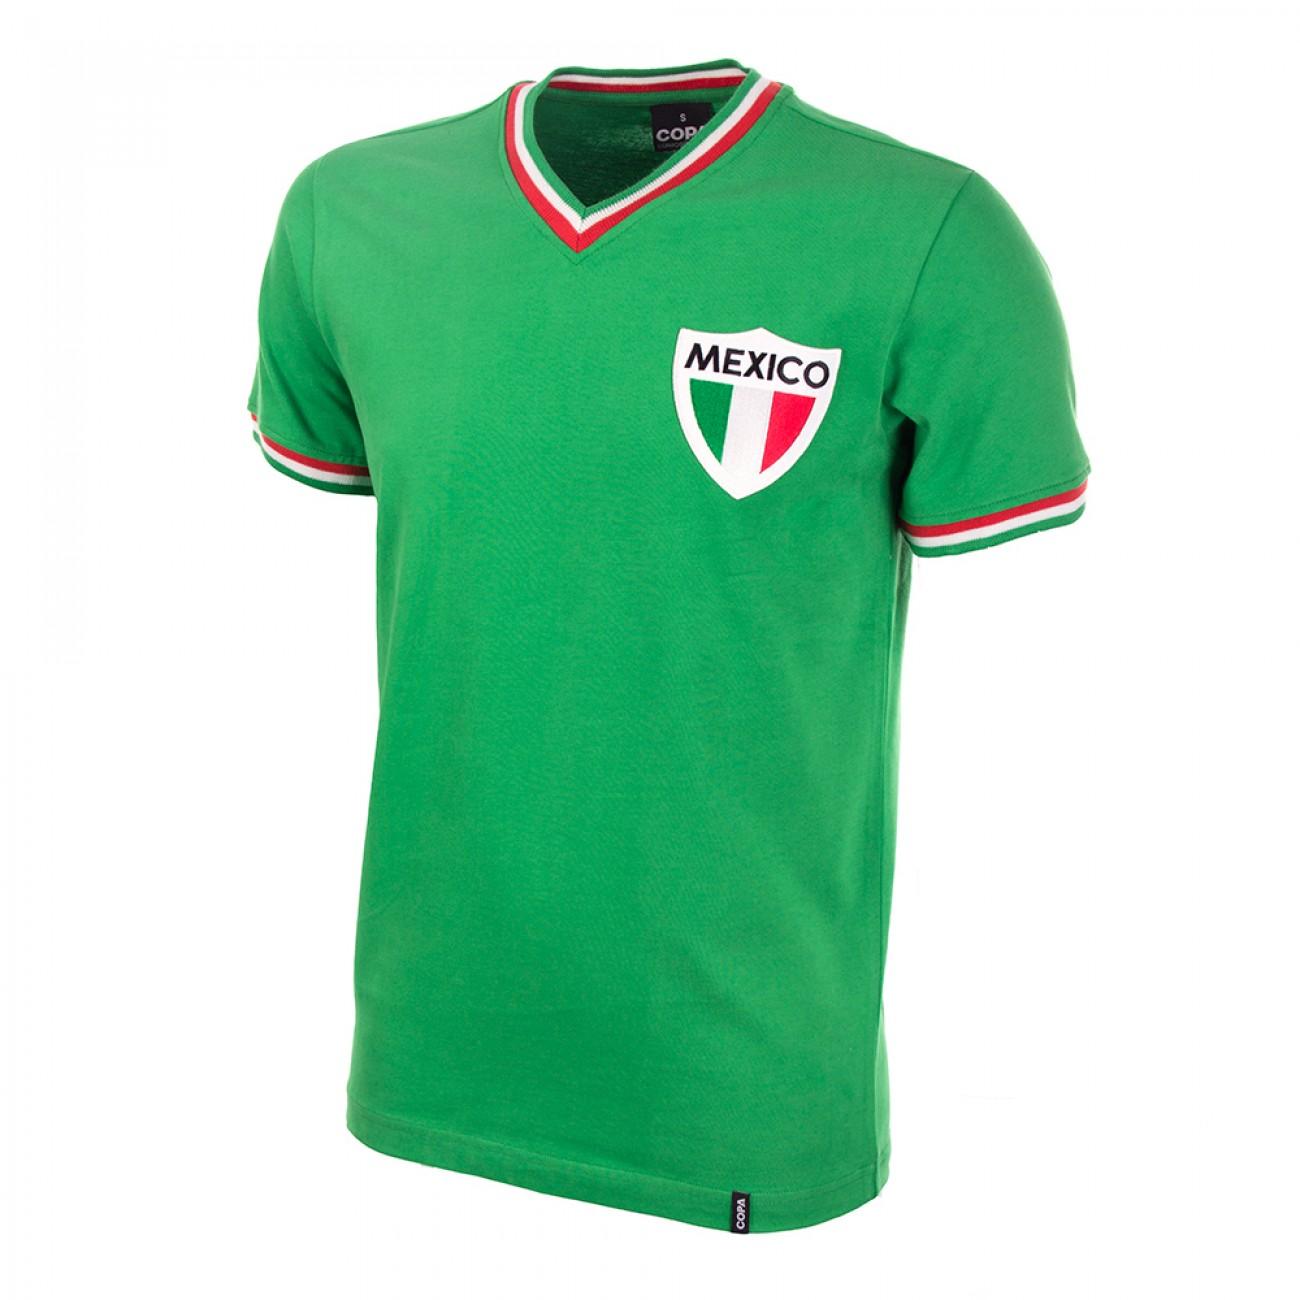 http://www.retrofootball.es/ropa-de-futbol/camiseta-retro-mexico-1970.html